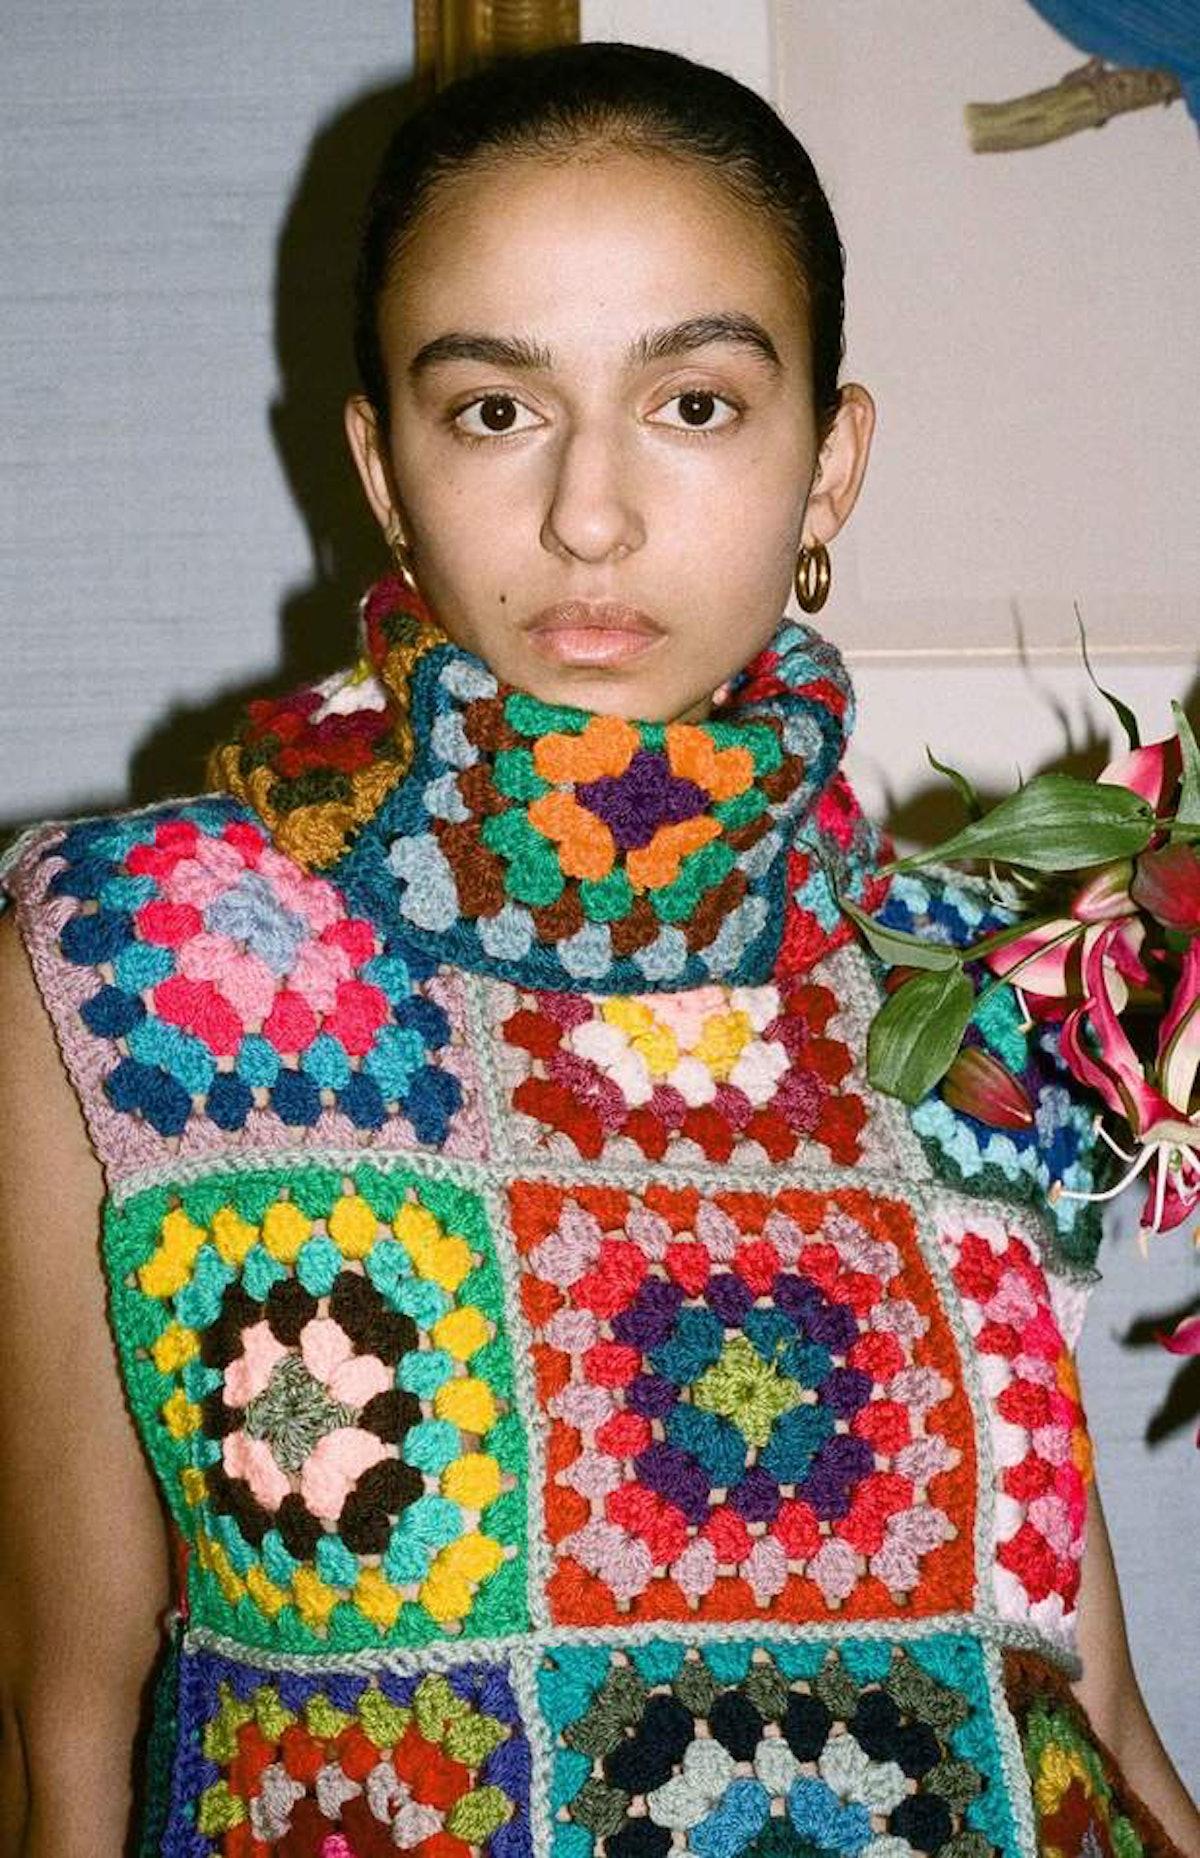 Nicole Crochet Top